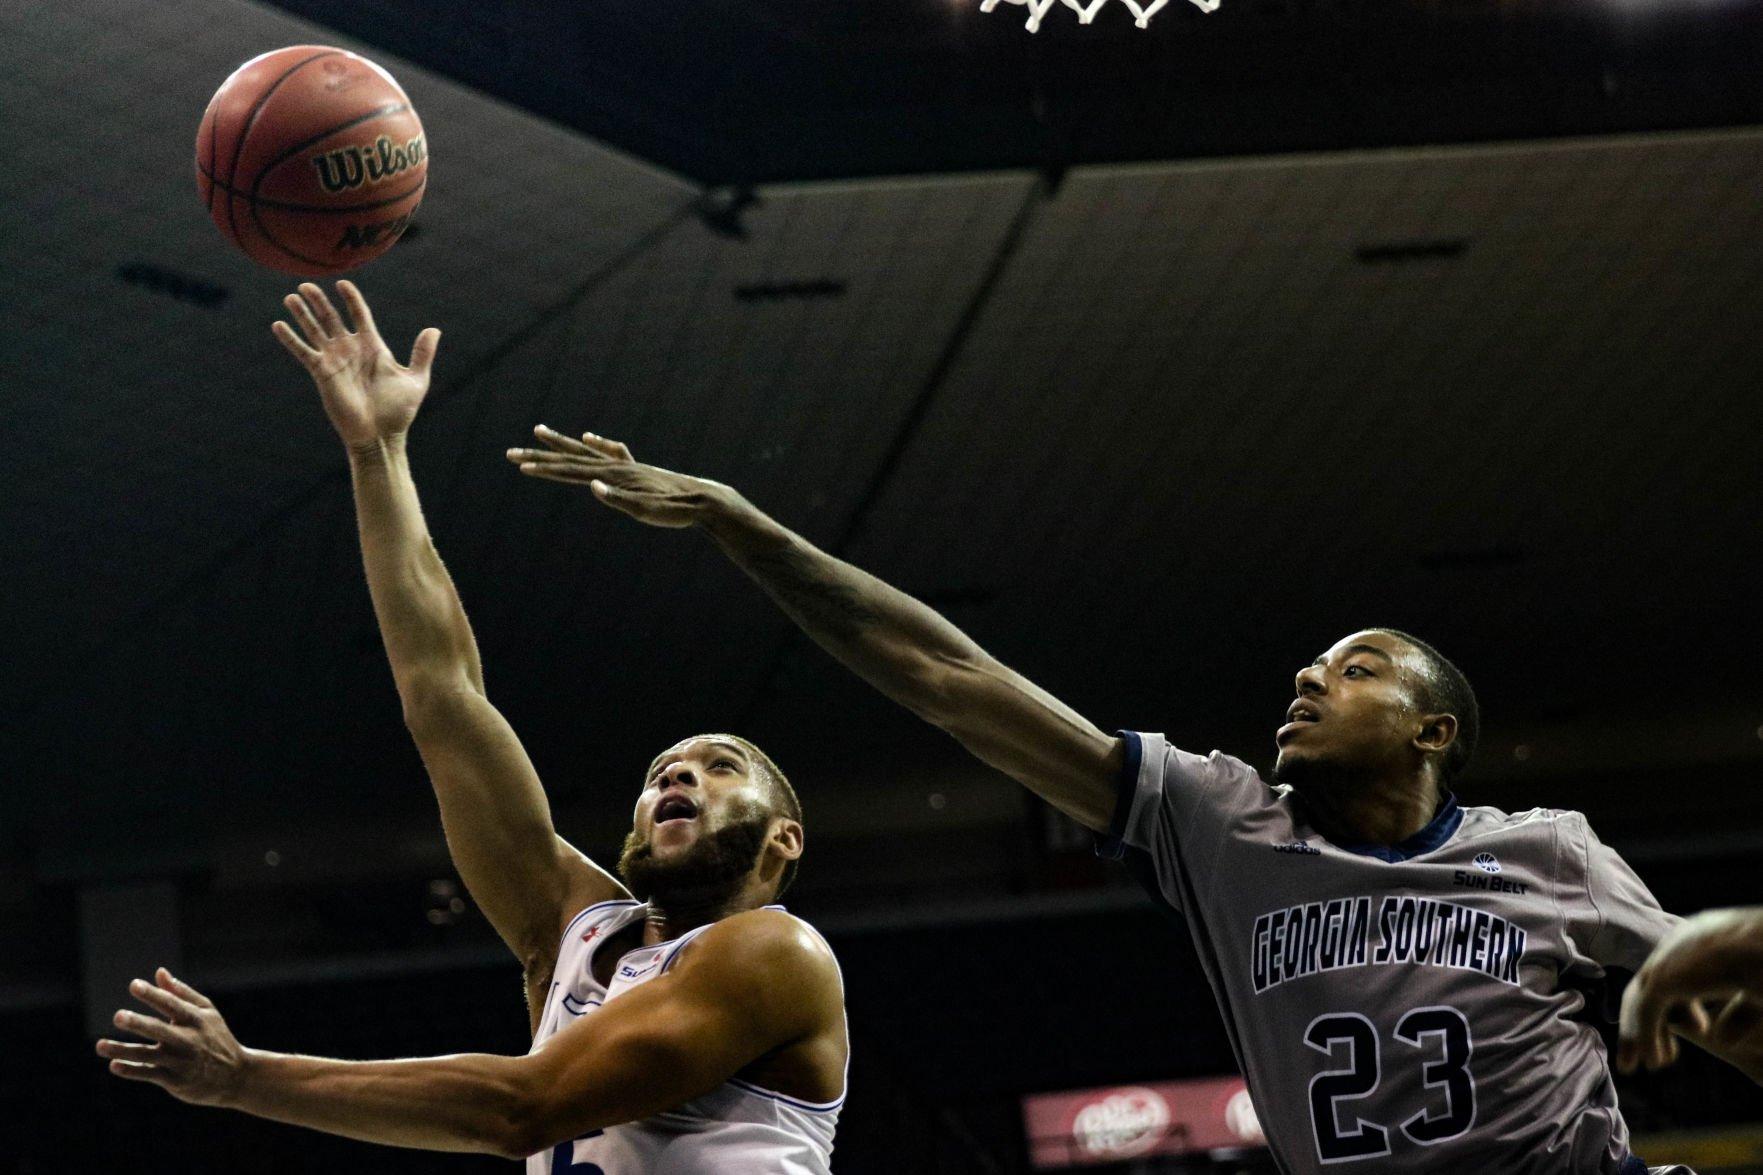 Mavericks advance to championship final with win over Georgia Southern University